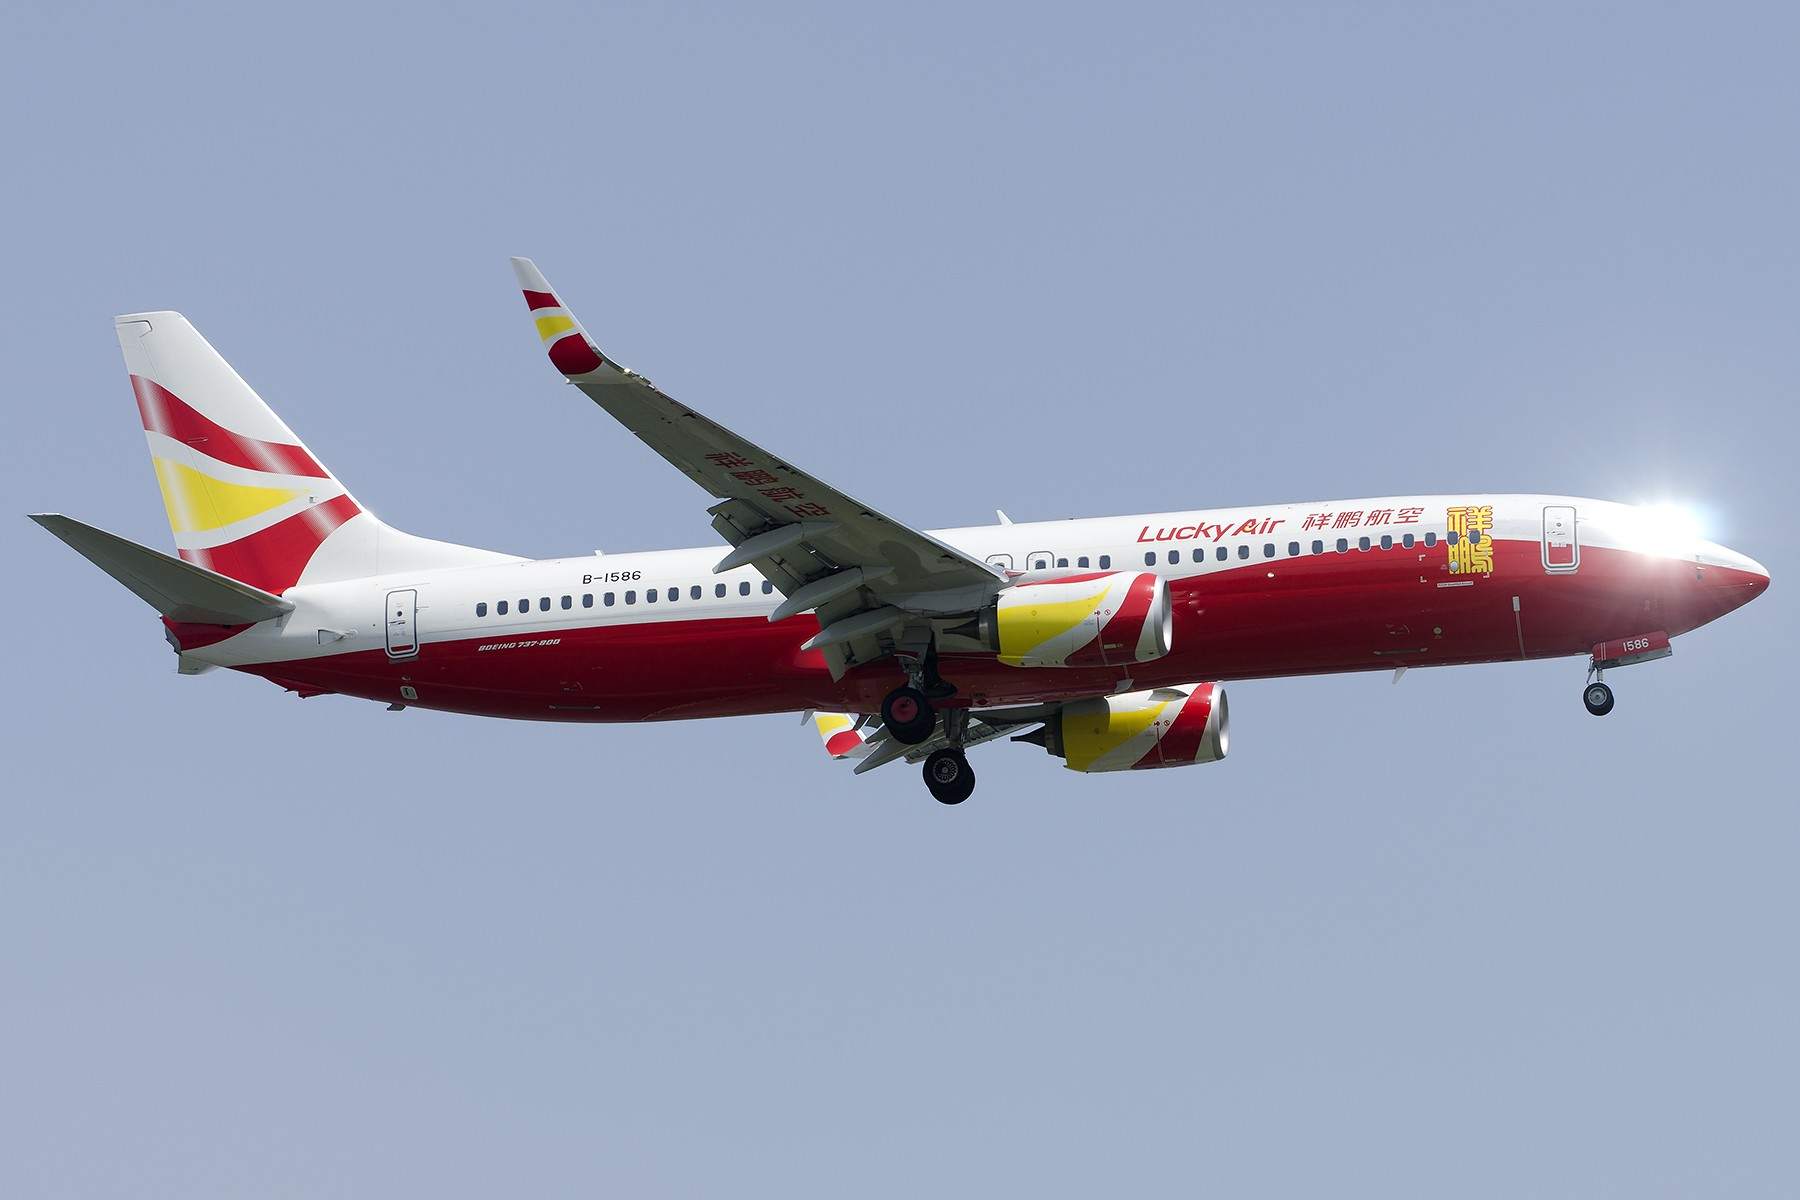 Re:[原创][原创]【SHA拍机*1800大图】4月拍的了,记得那天好货还挺多 BOEING 737-800 B-1586 中国上海虹桥国际机场